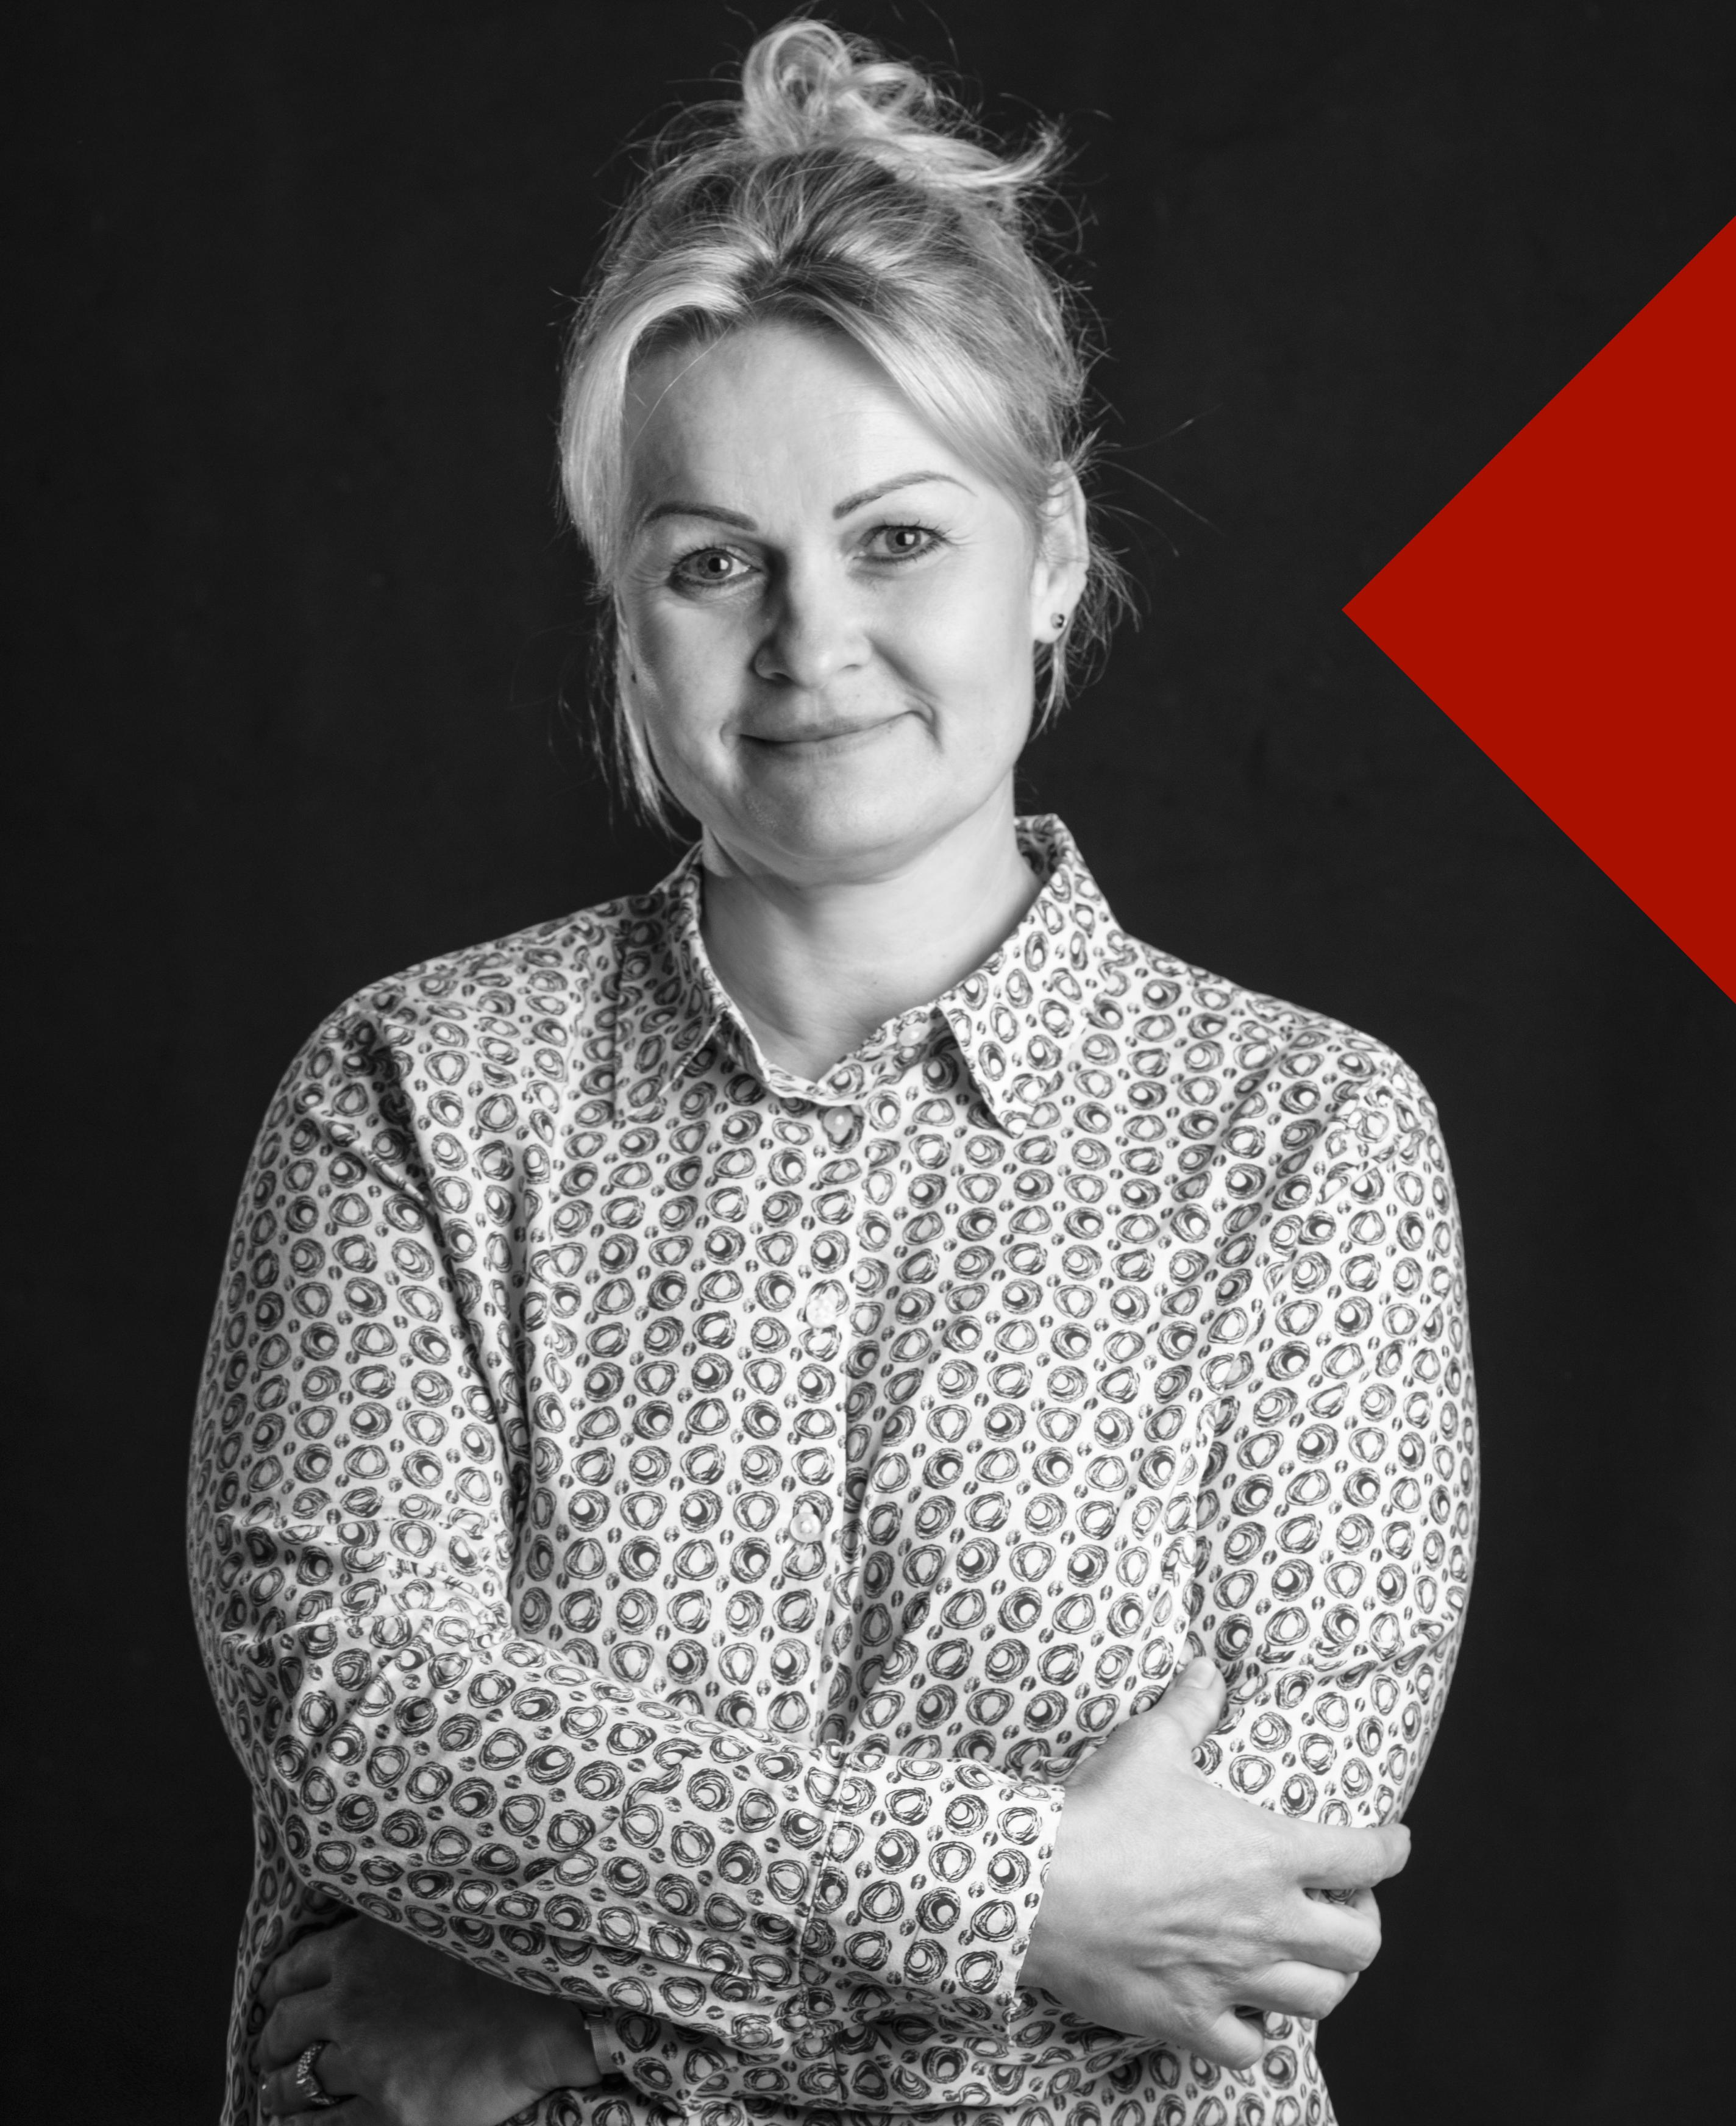 Sylwia Sobiech